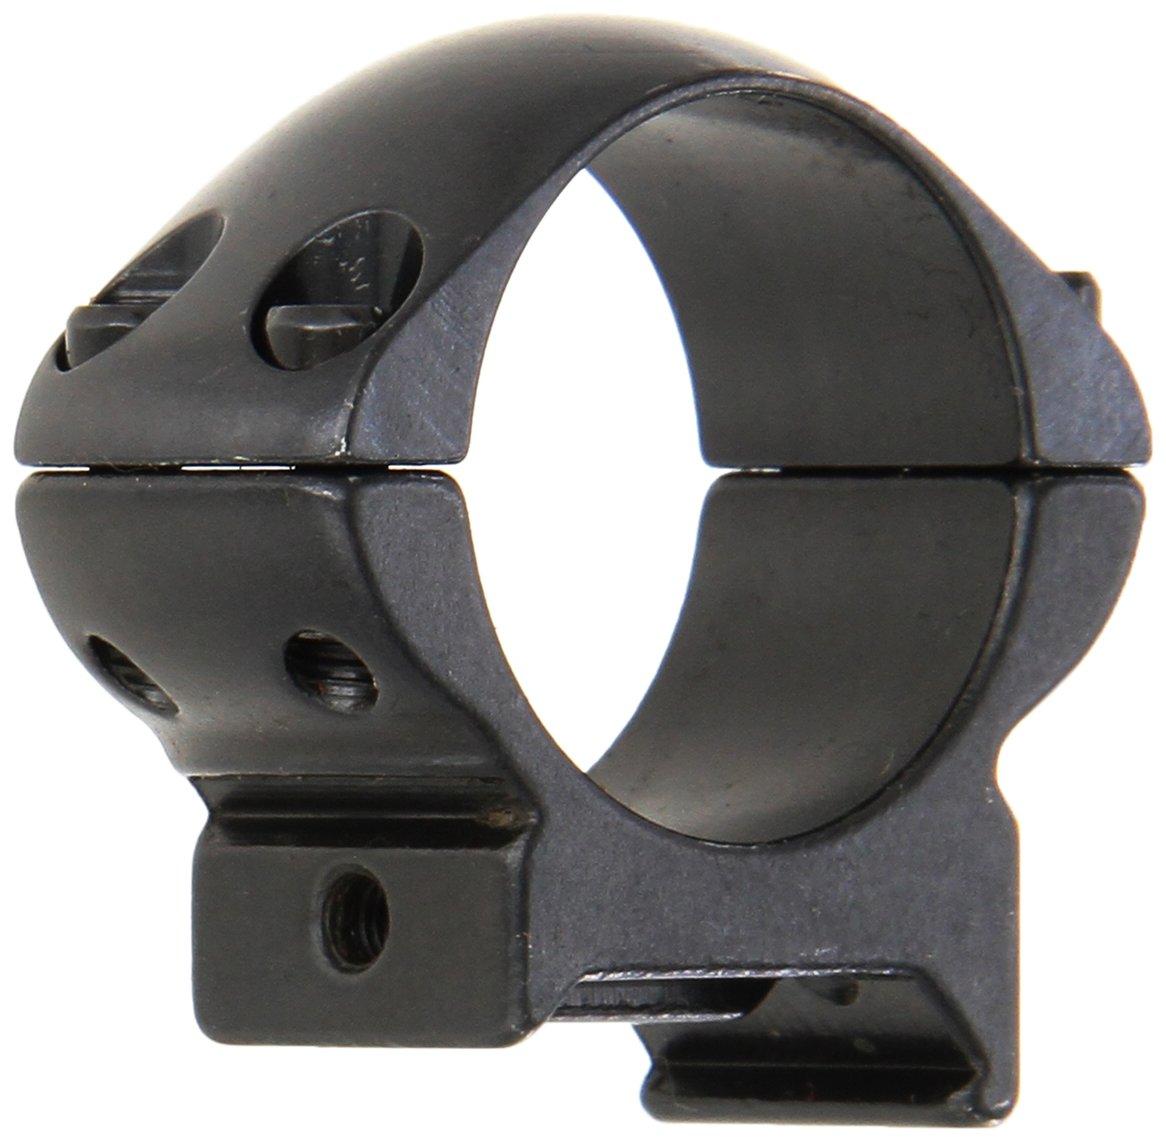 WEAVER Grand Slam Steel 1-Inch Medium Top Mount Rings (Gloss Black) by WEAVER